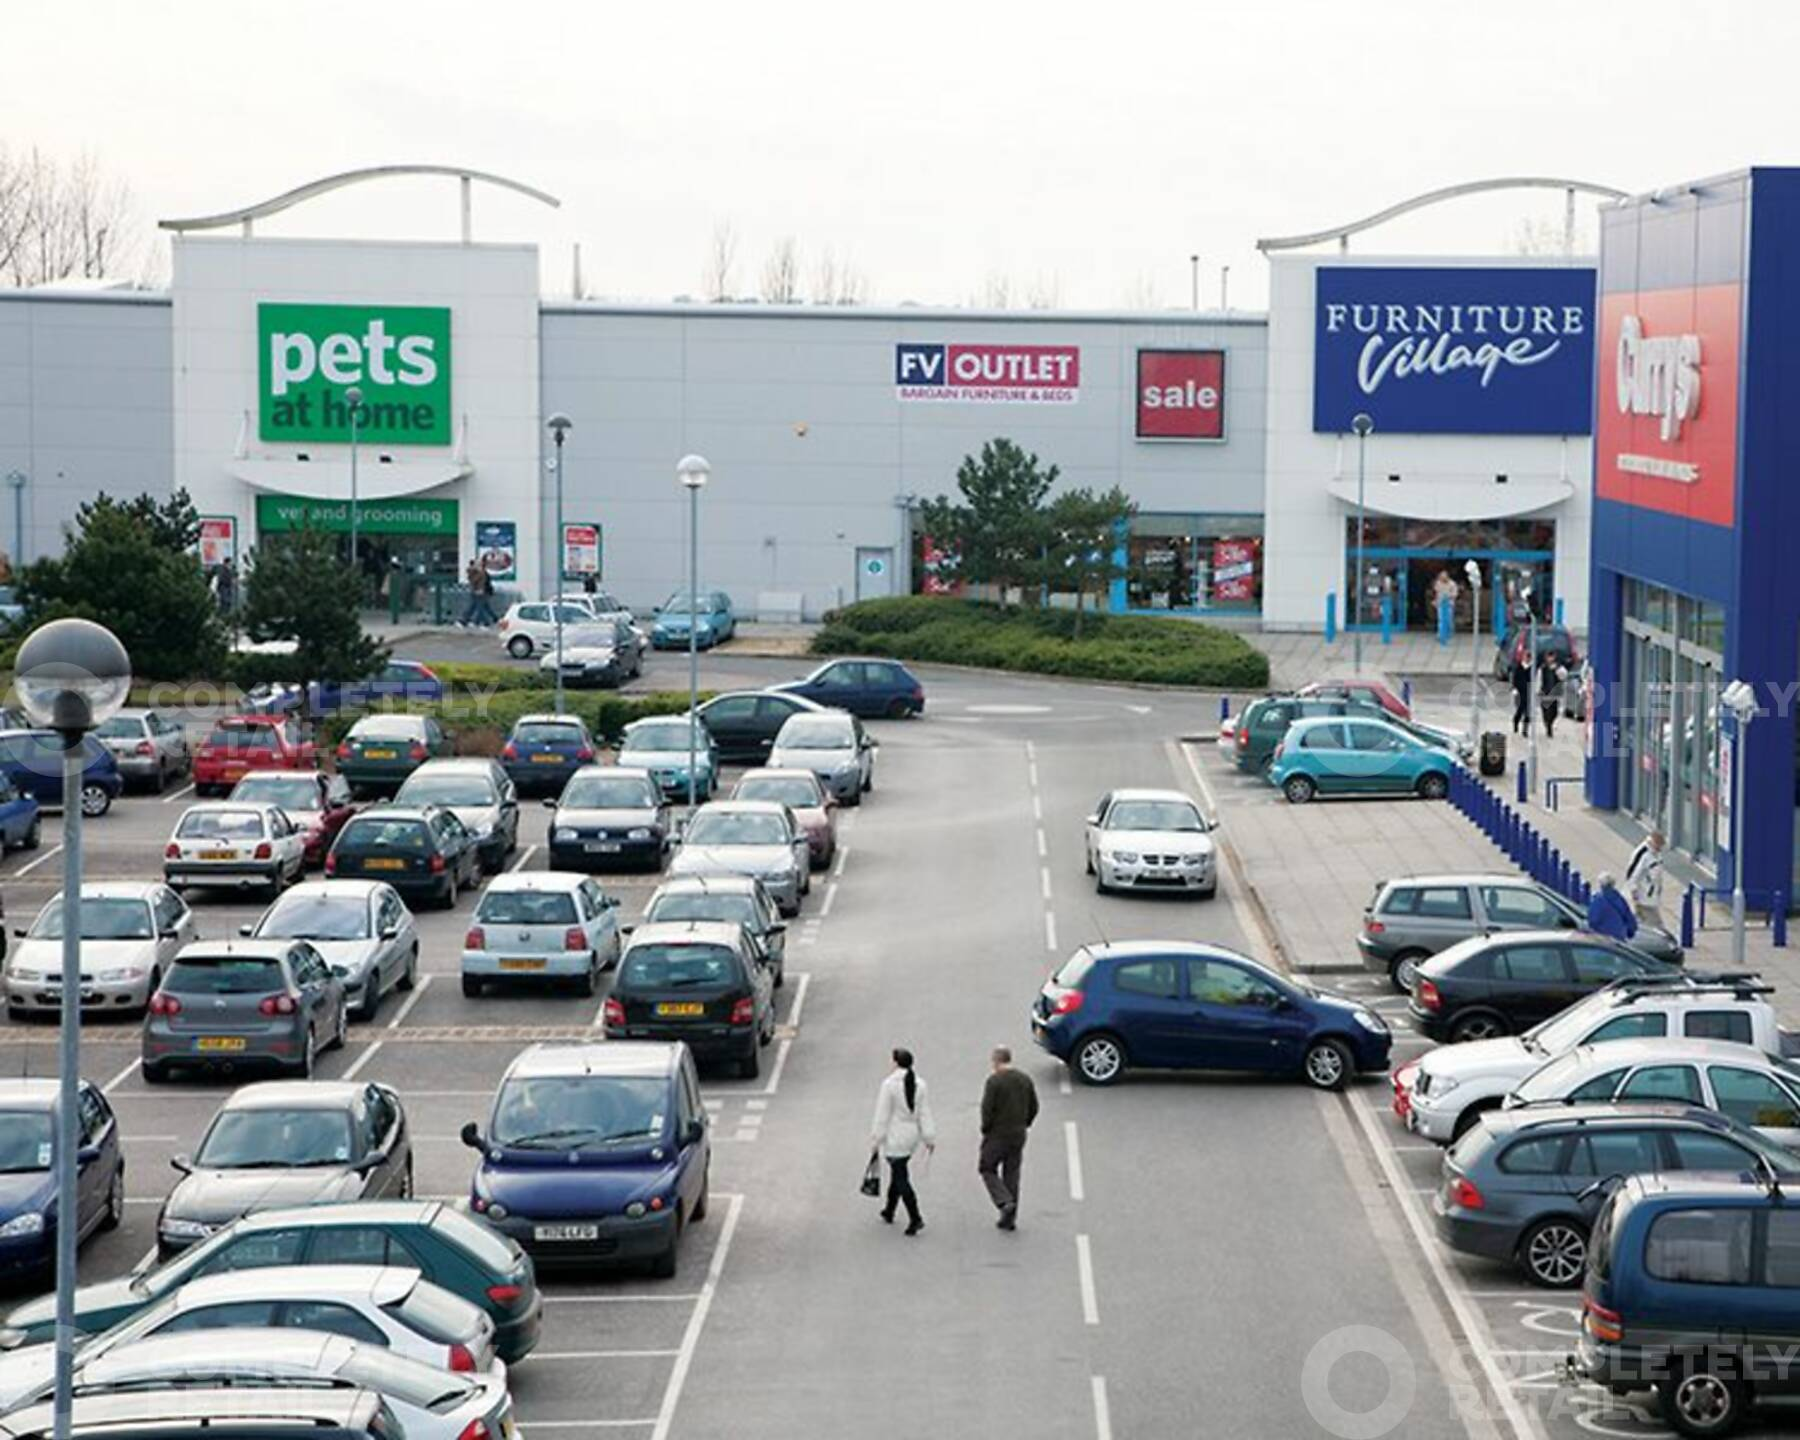 Wessex Gate Retail Park